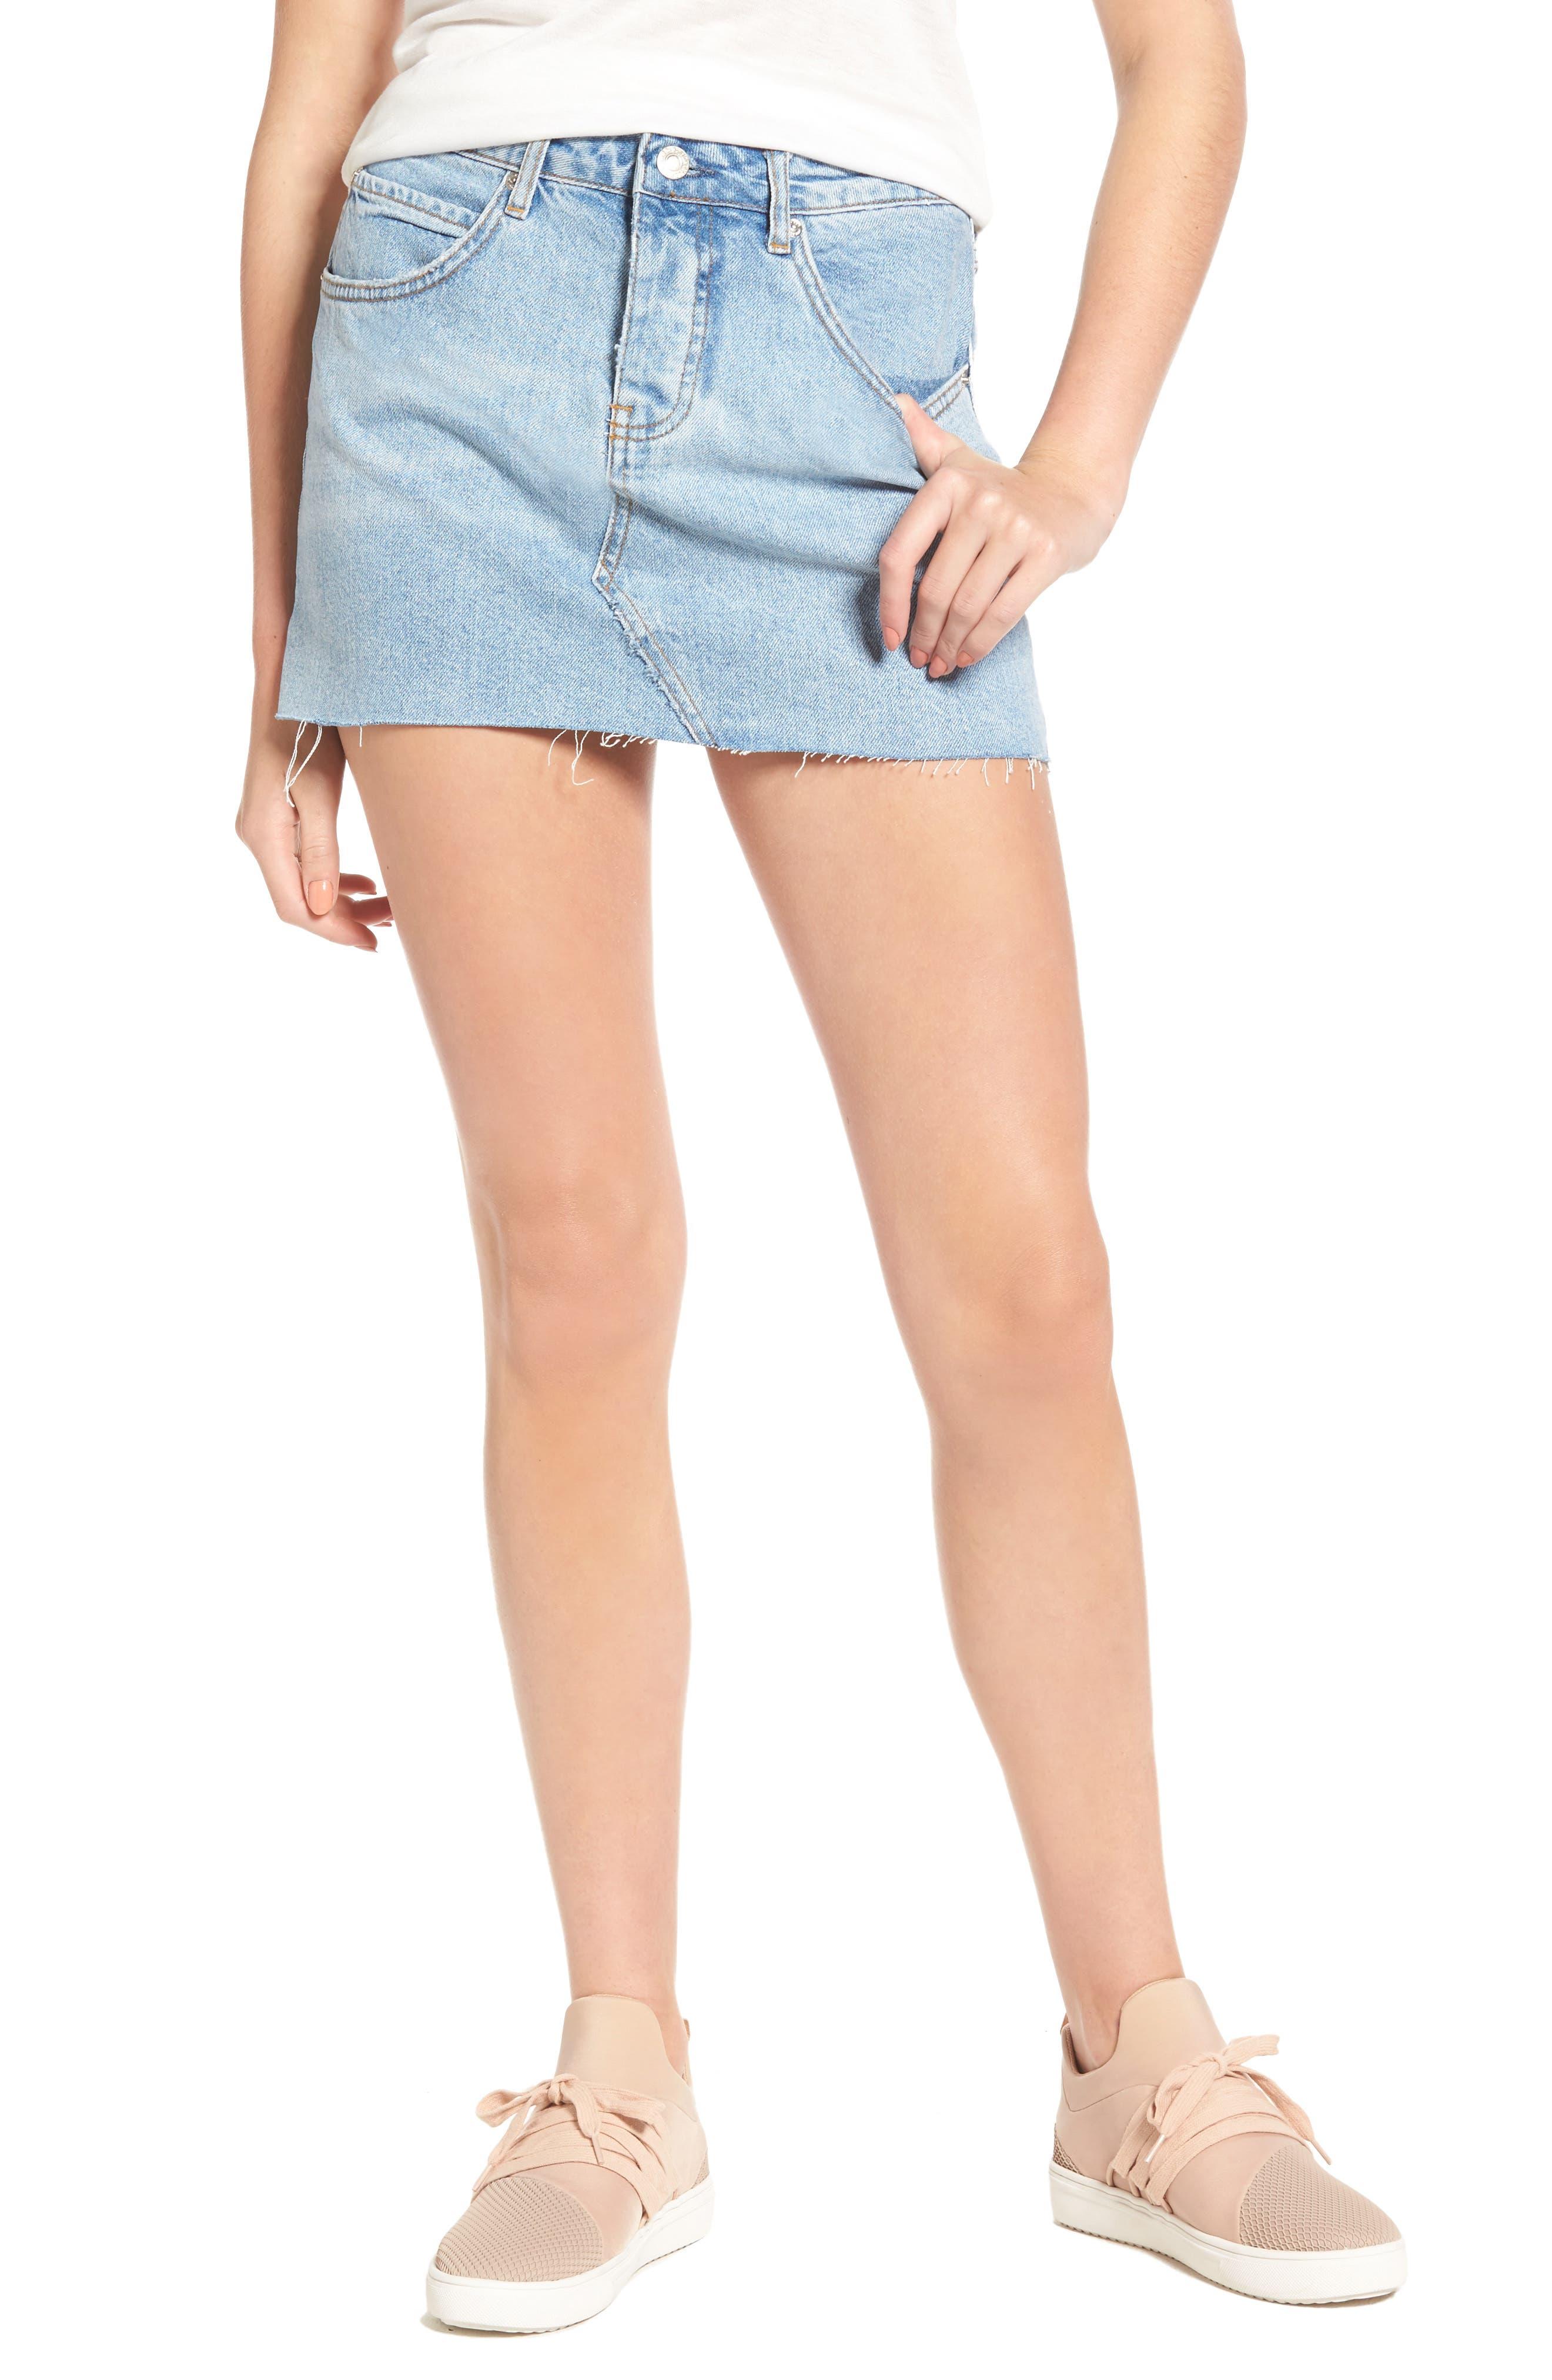 SINCERELY JULES Denim Miniskirt